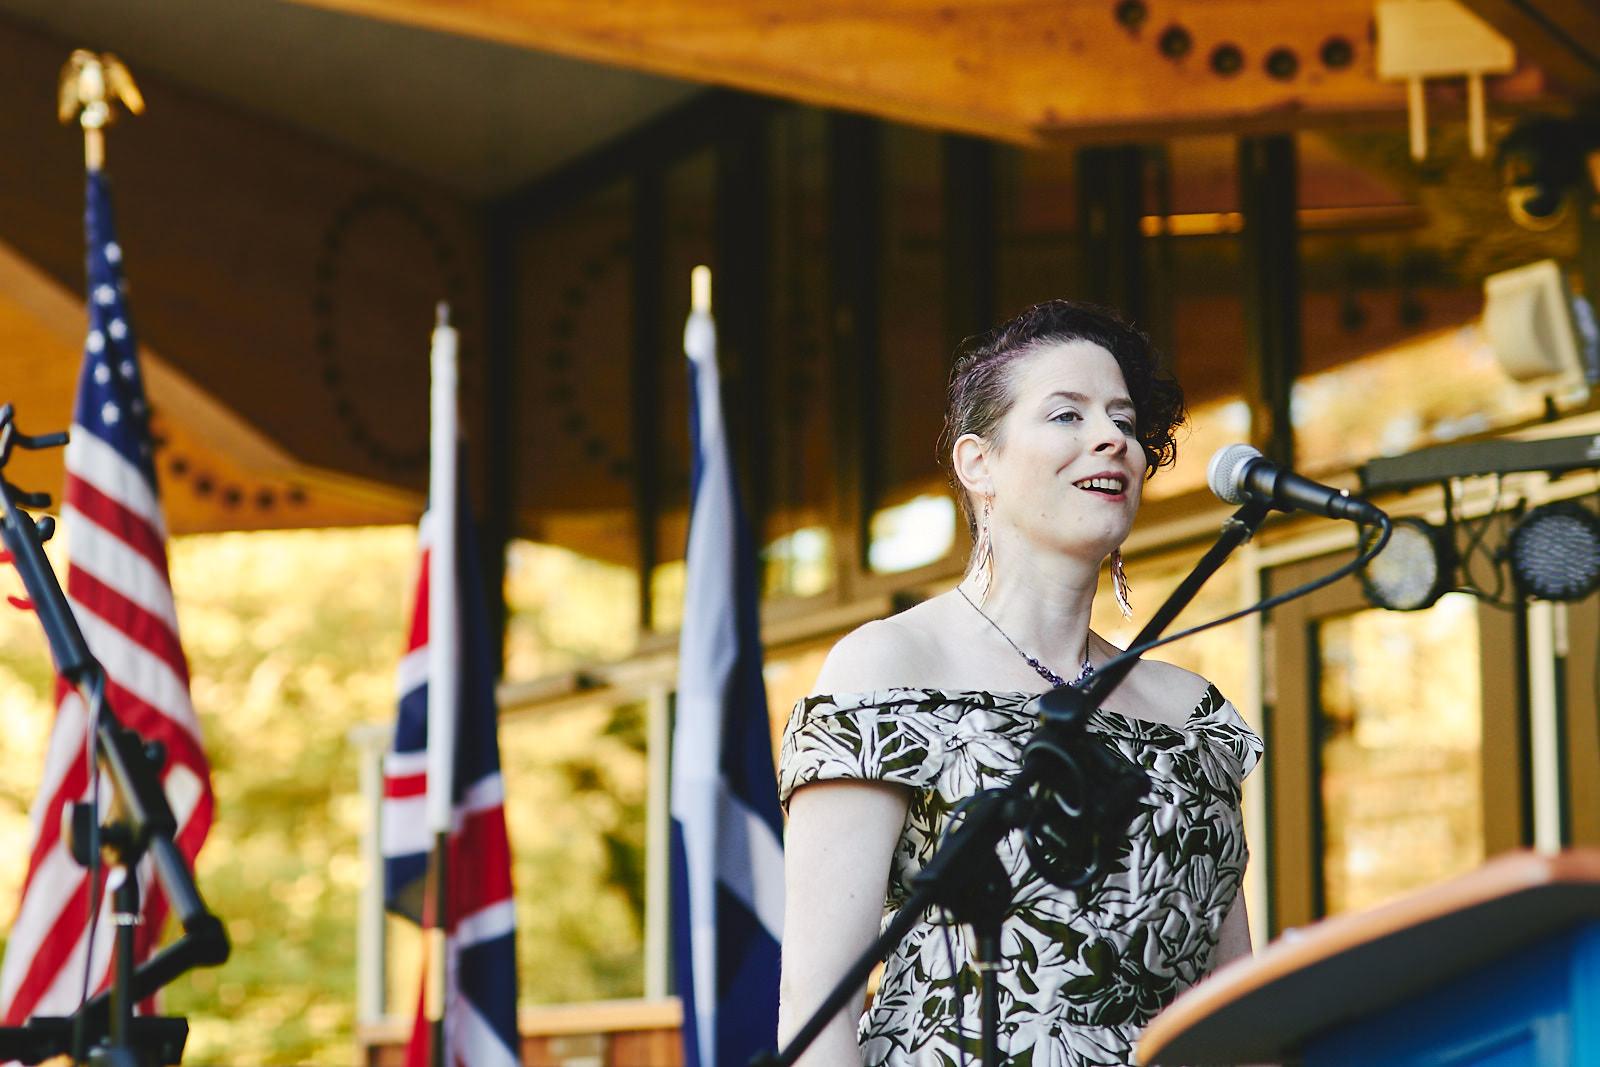 US consulate Edinburgh 4th of July celebration 2018 - 150 web.jpg